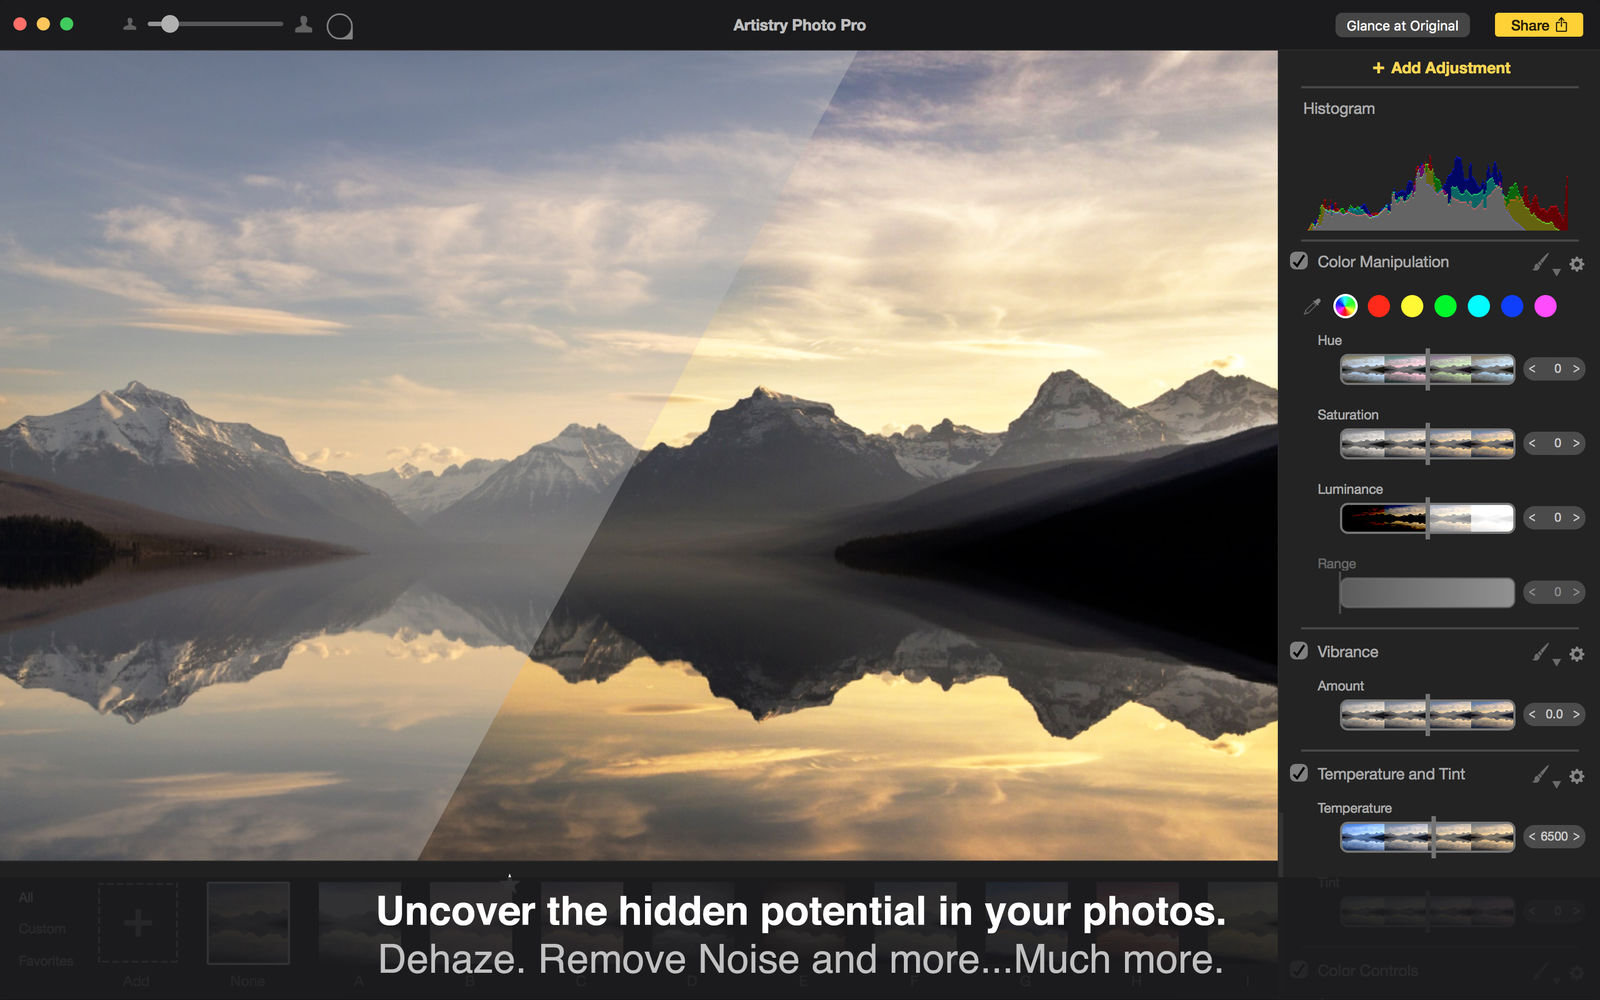 Artistry Photo Pro 3.0.1功能强大的照片编辑器